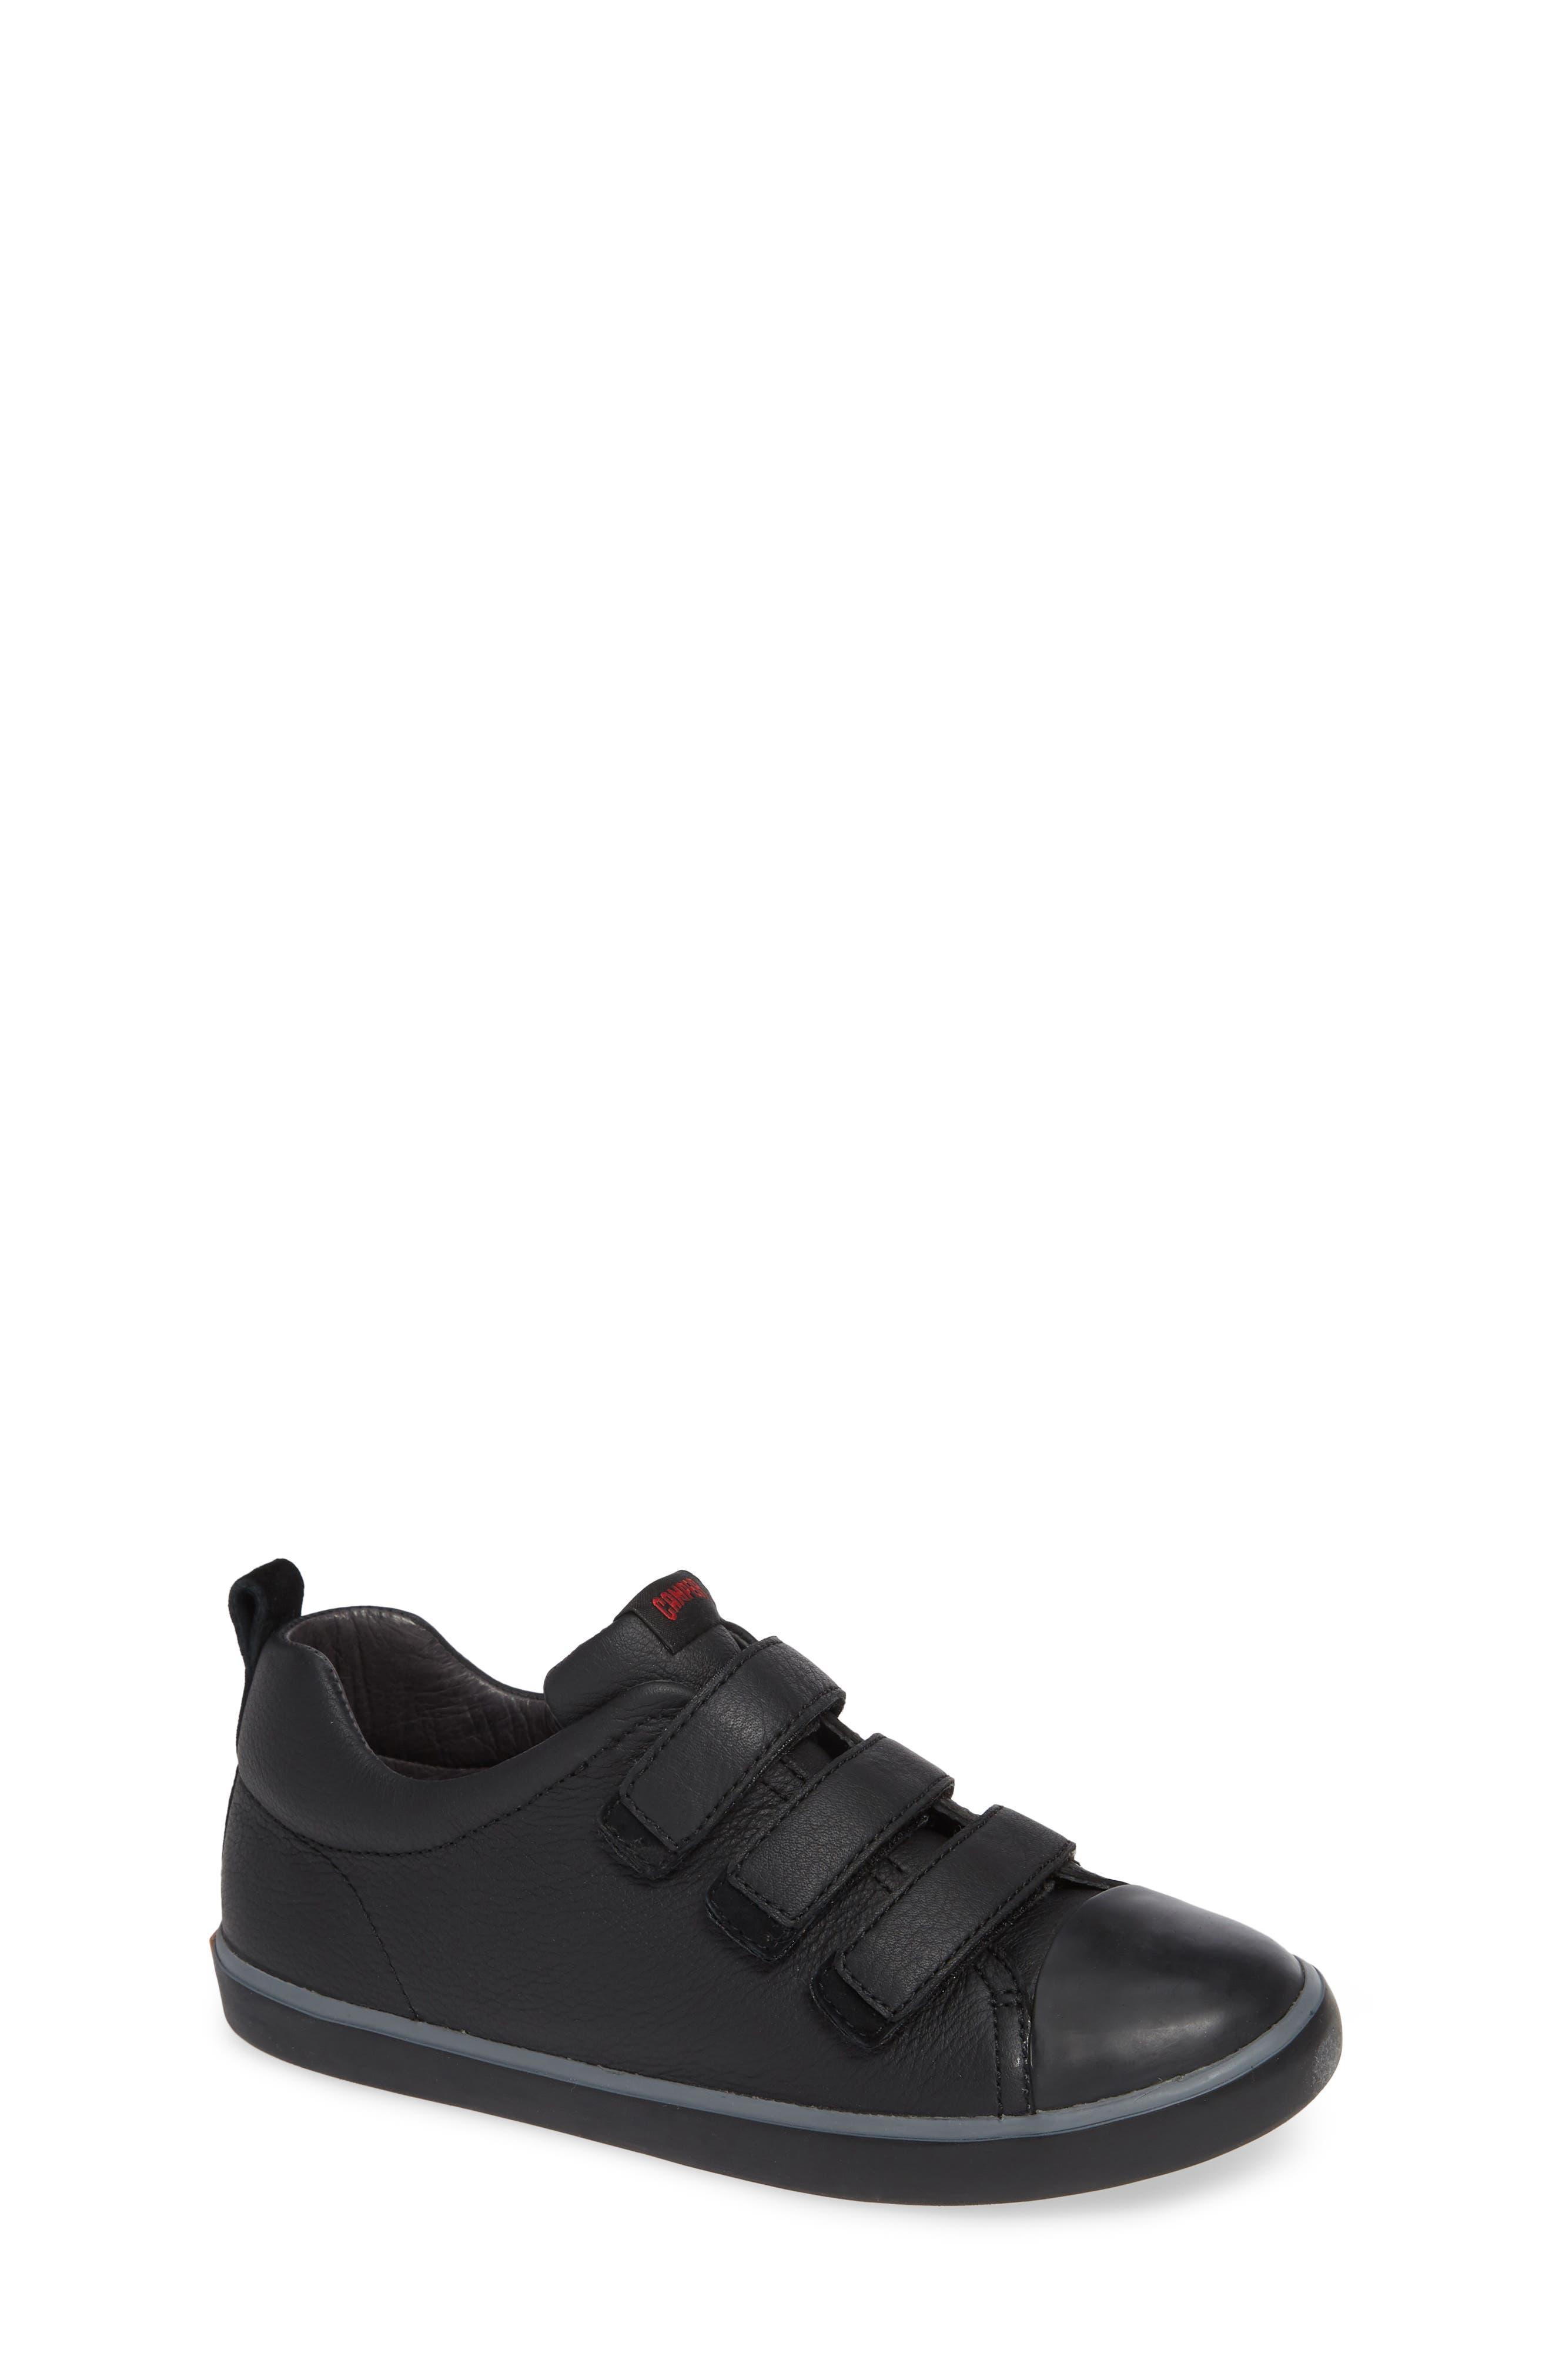 CAMPER Pursuit Sneaker, Main, color, BLACK